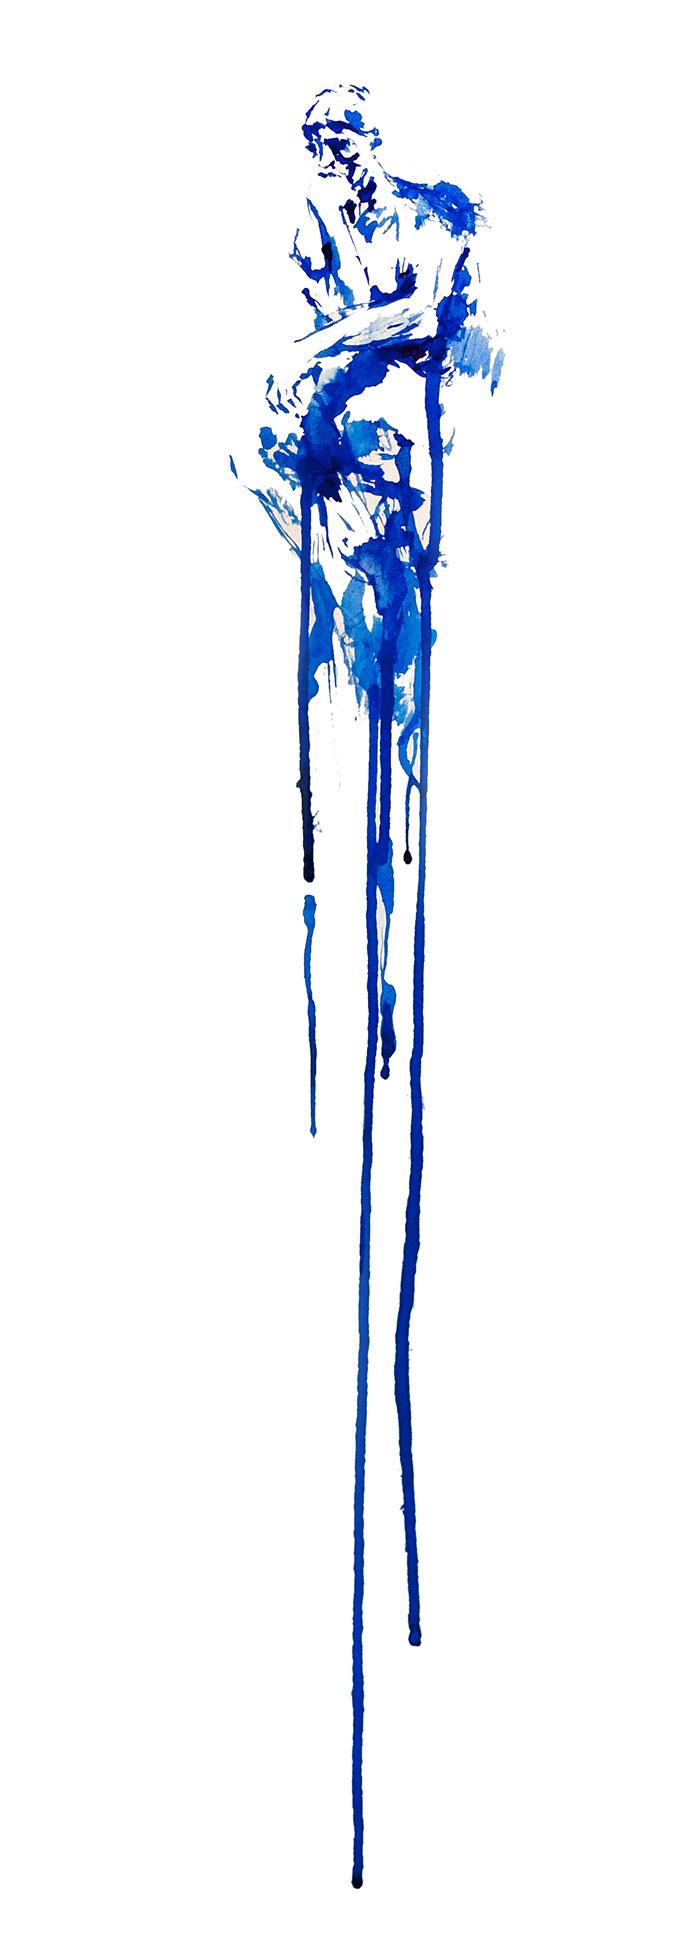 painting-progression-practice-makes-perfect-marc-allante-46